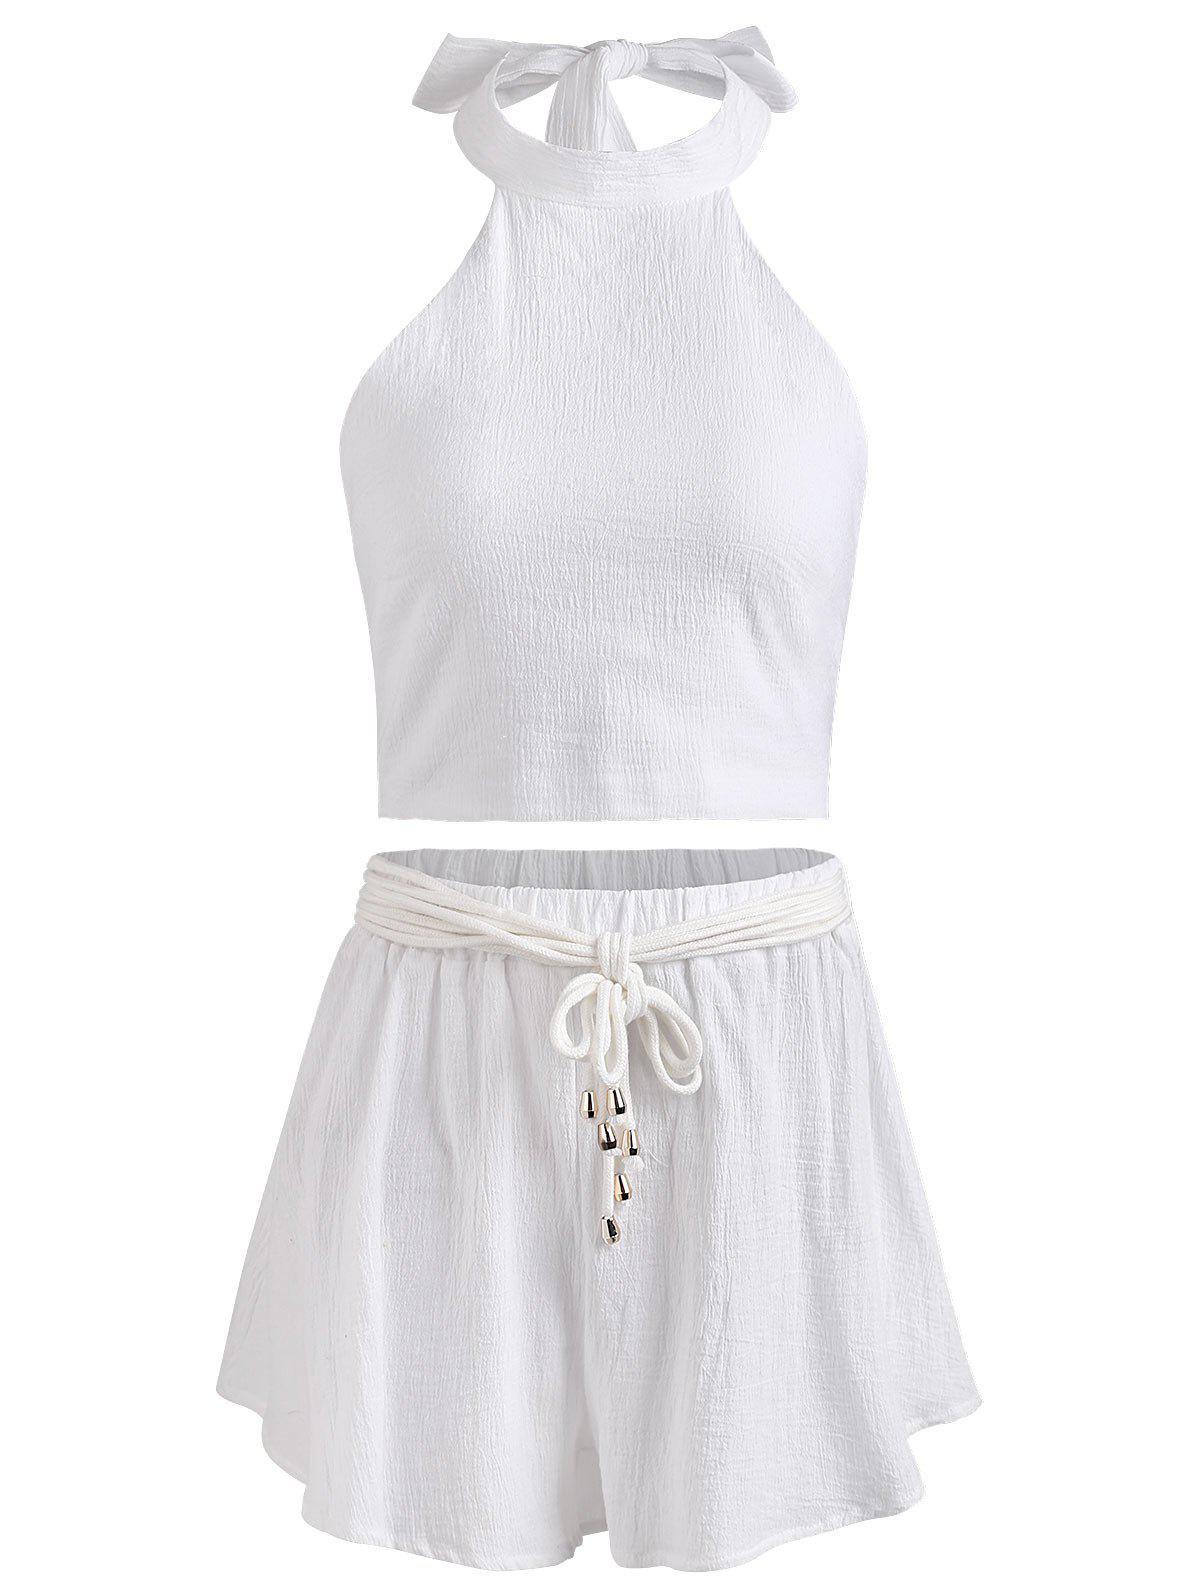 Halter Backless Crop Top and Shorts Set